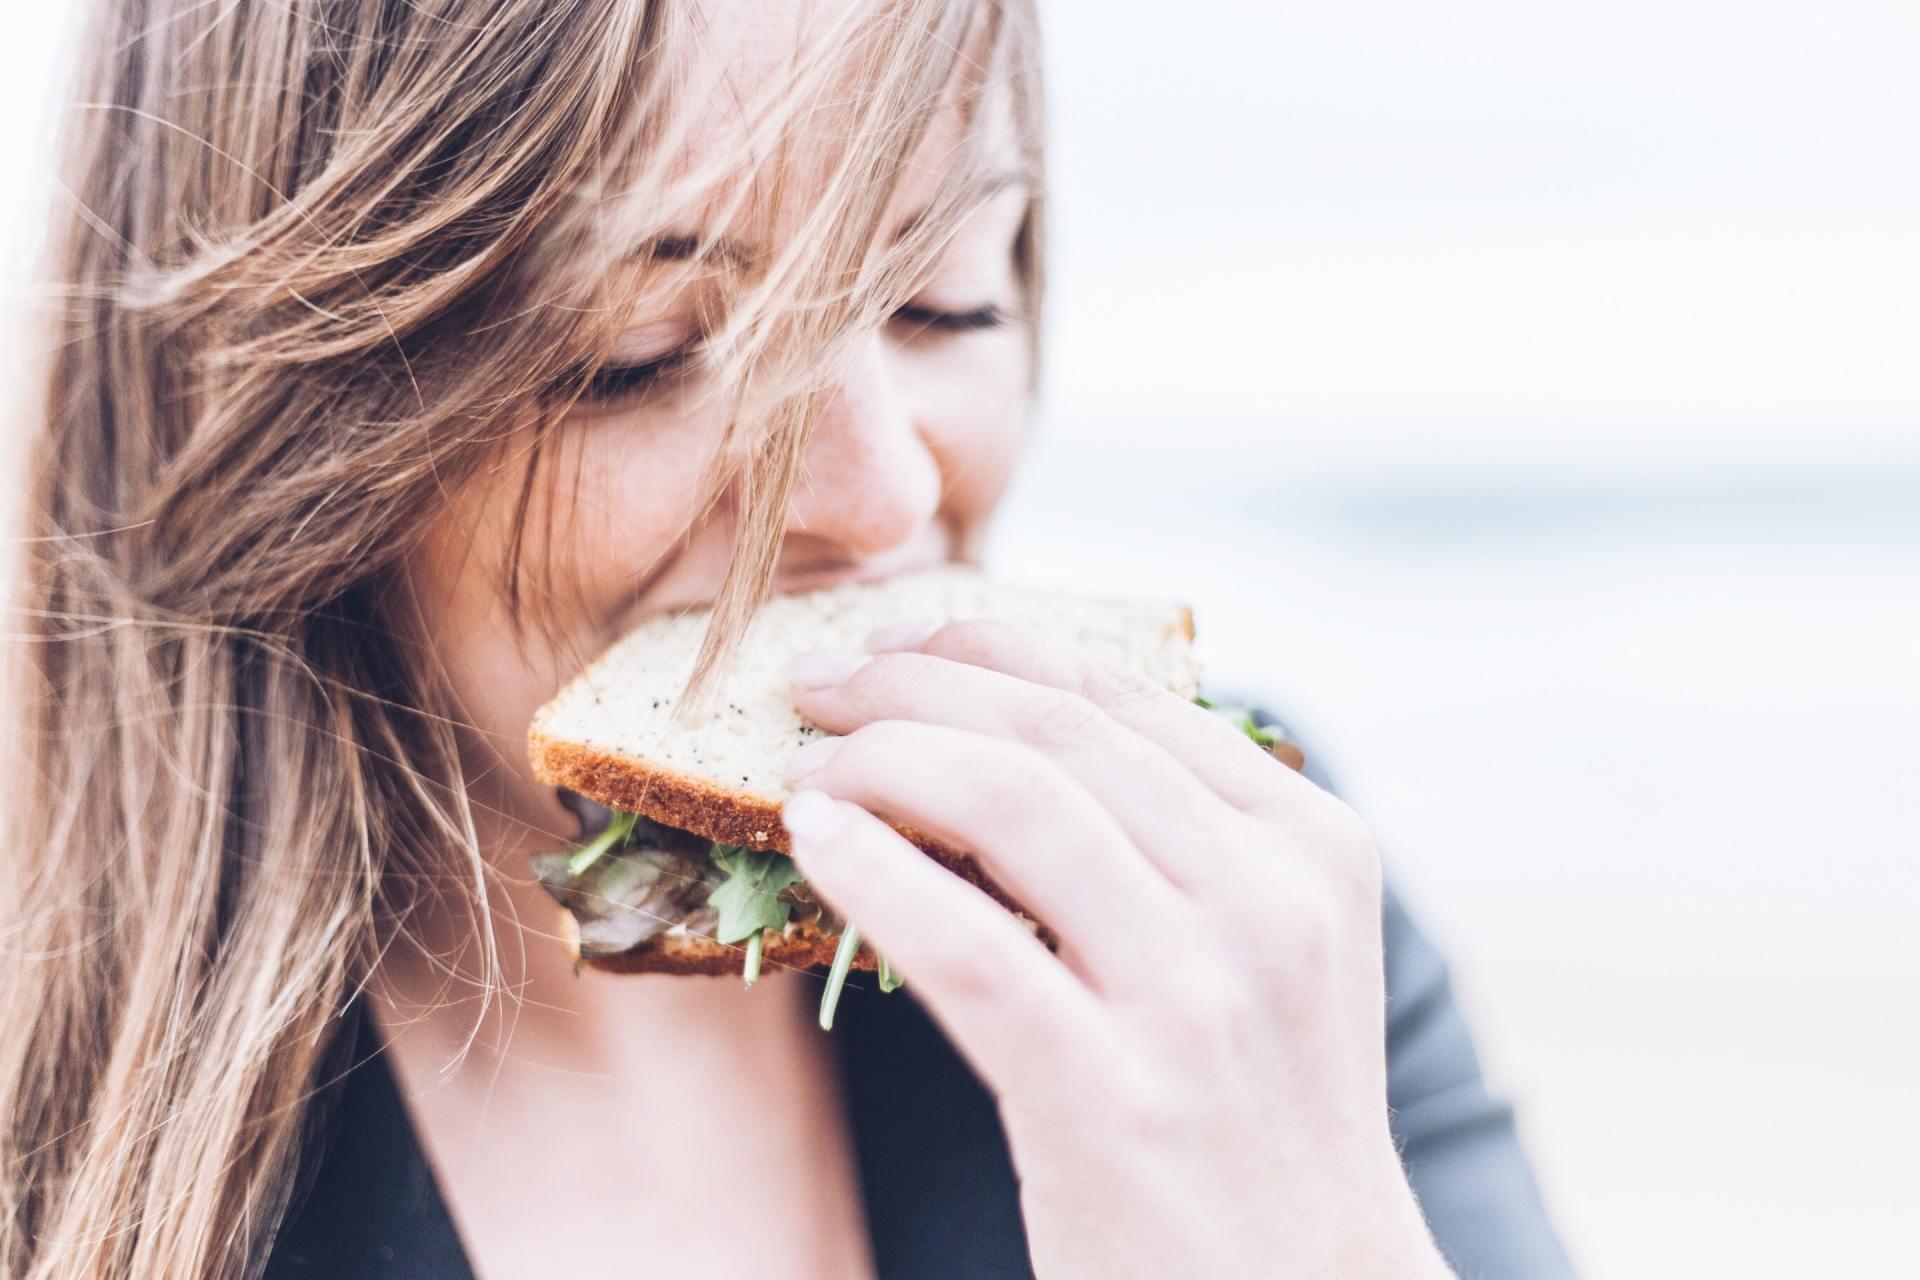 Eating Sandwich